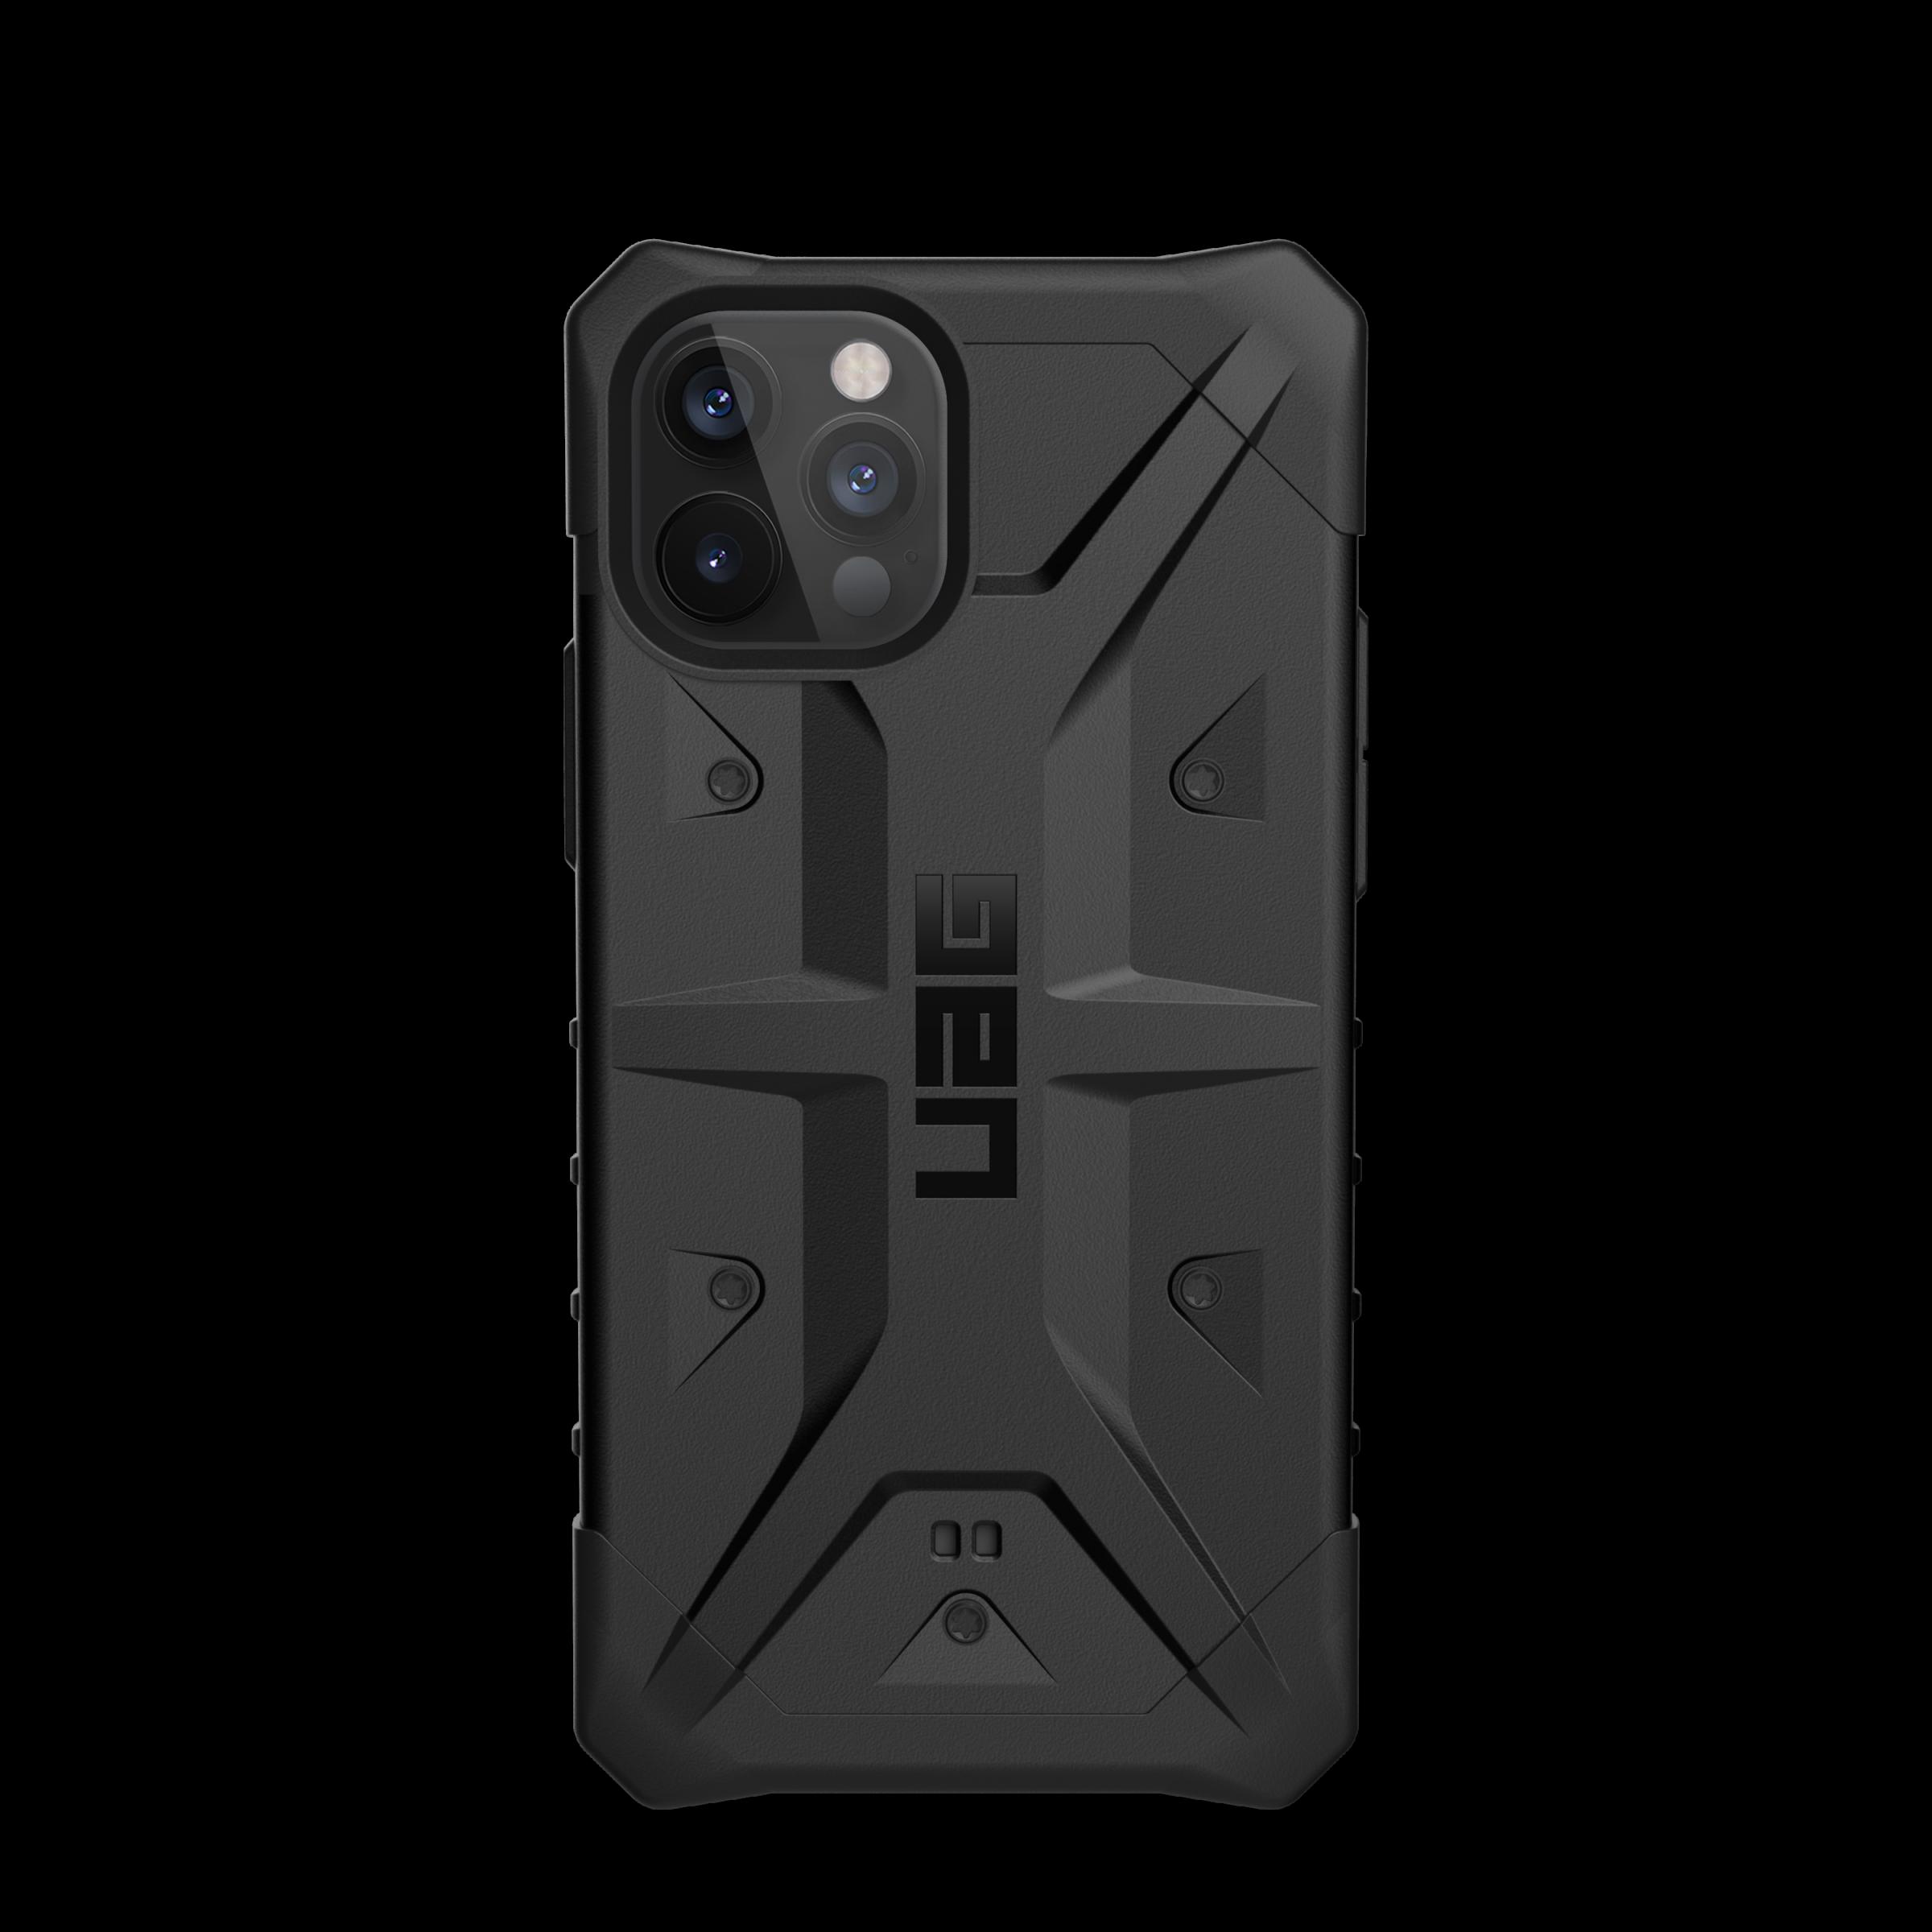 Pathfinder Series Case iPhone 12/12 Pro Black